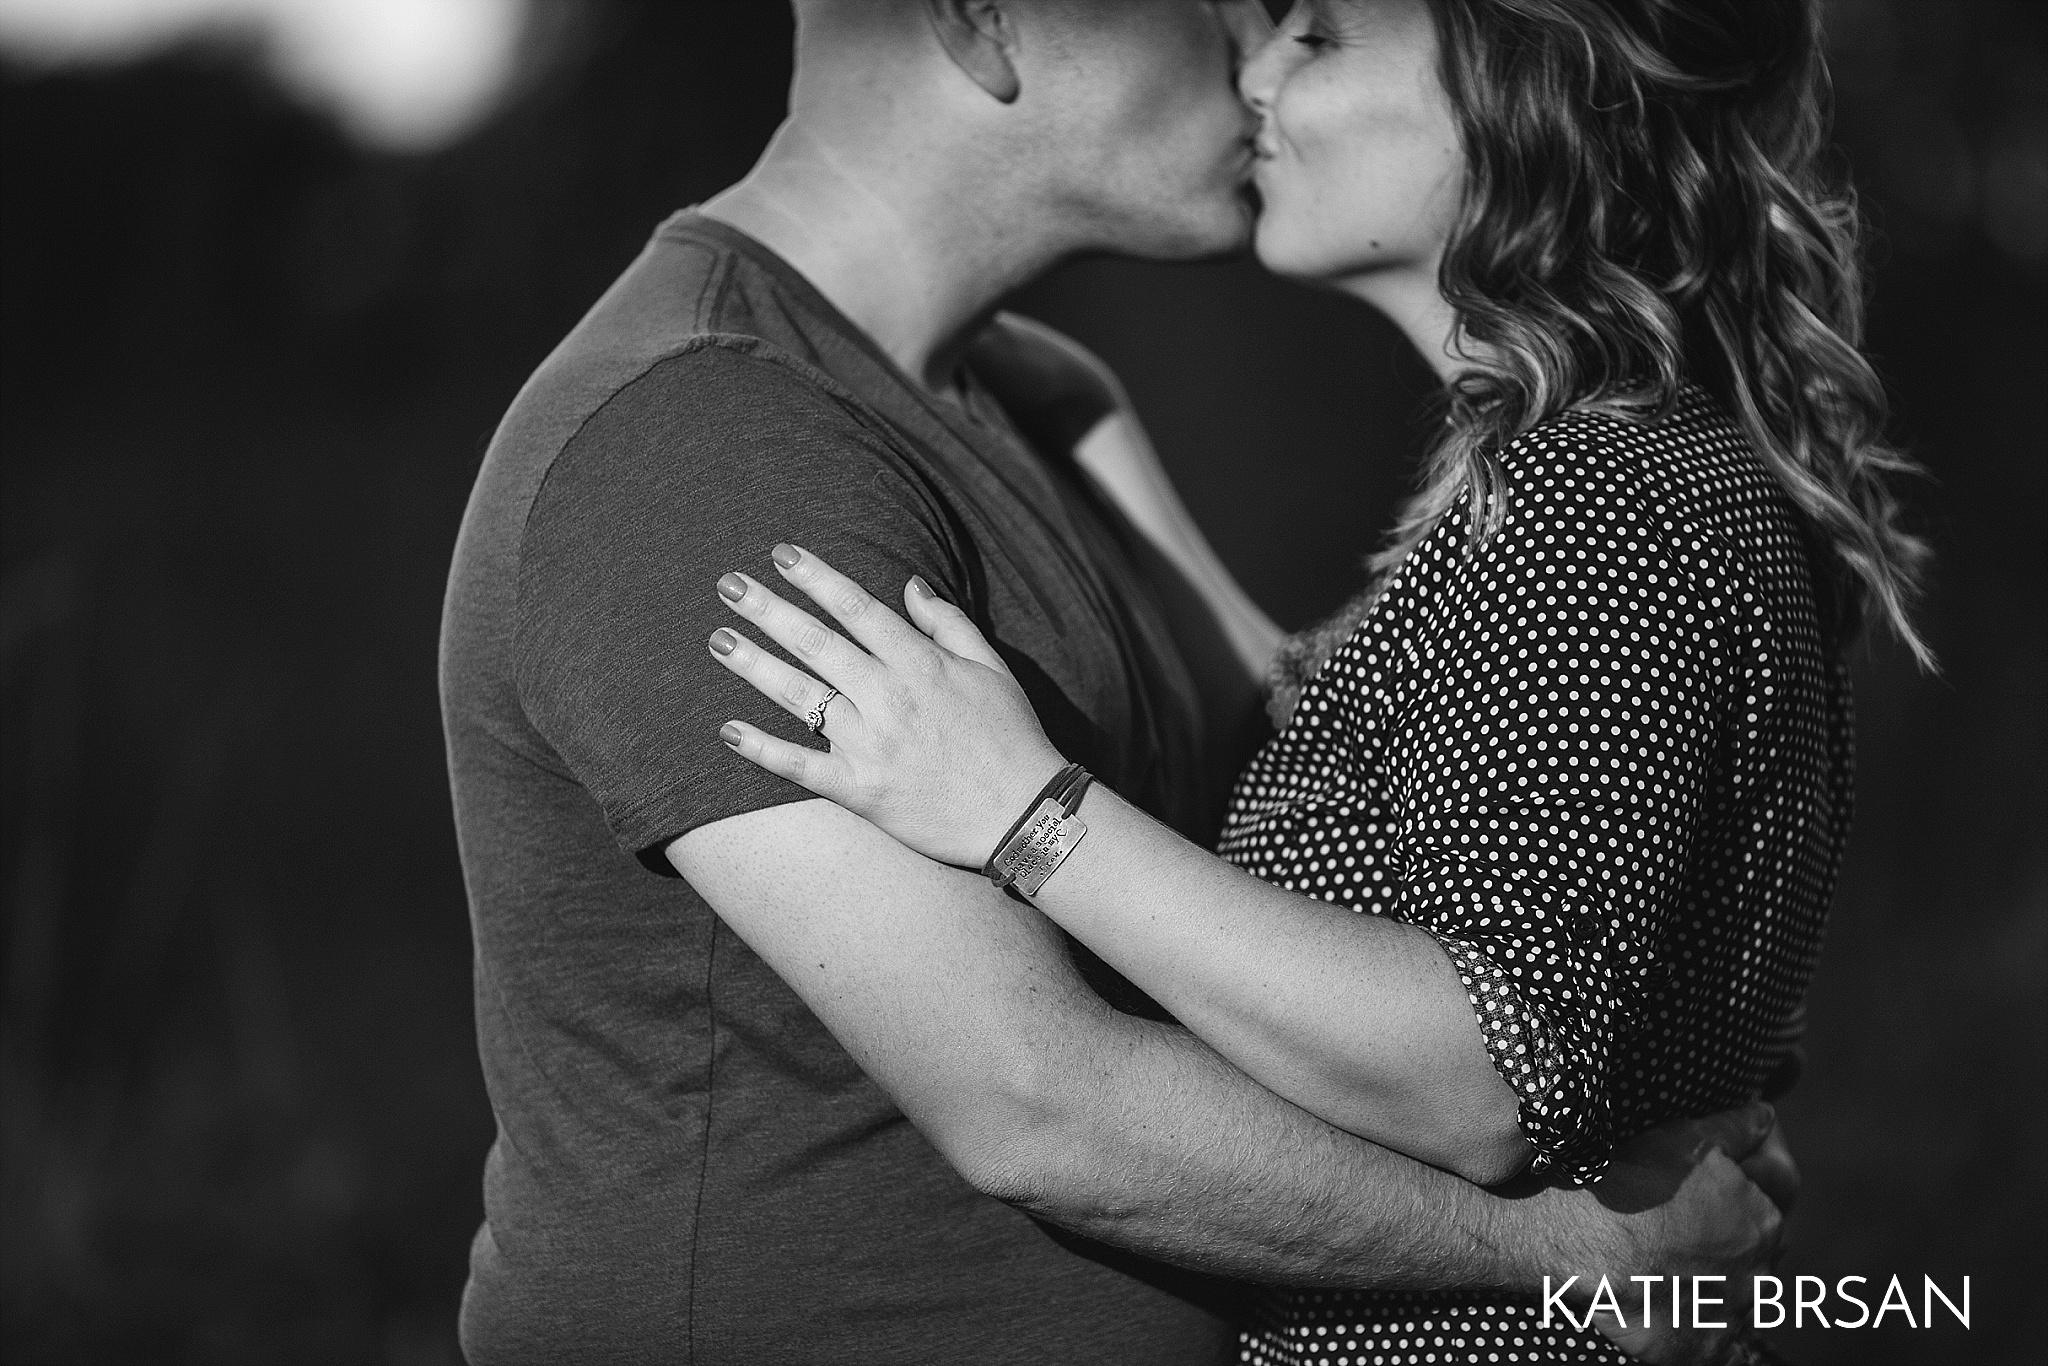 KatieBrsan-Chicago-Suburban-EngagementPictures-HadlyValley_0584.jpg